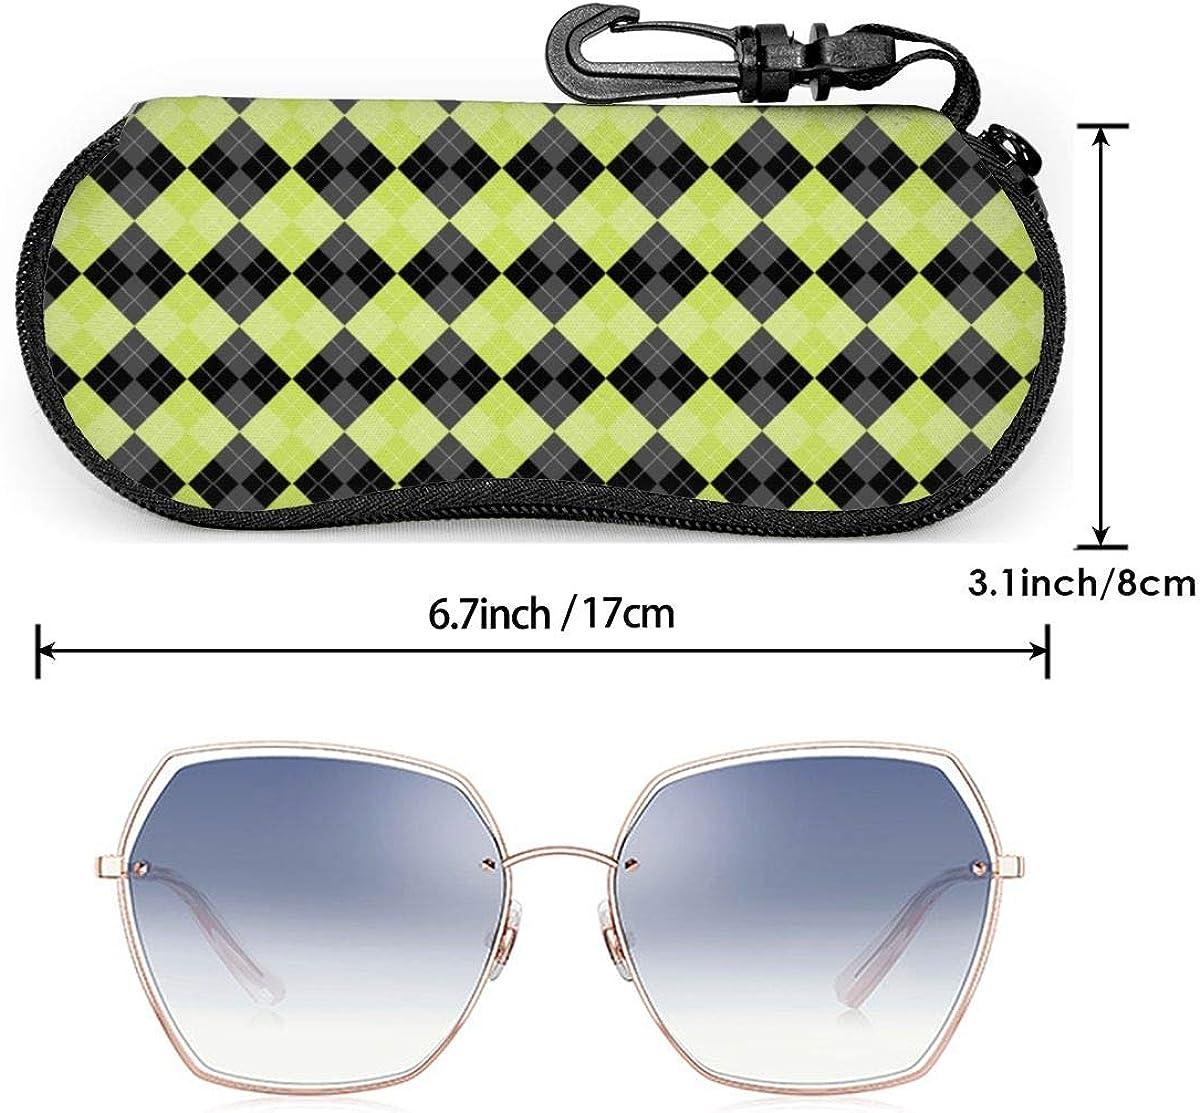 Sunglasses Soft Case Ultra Light Neoprene Zipper Eyeglass Case With Key Chain Bathroom Pattern